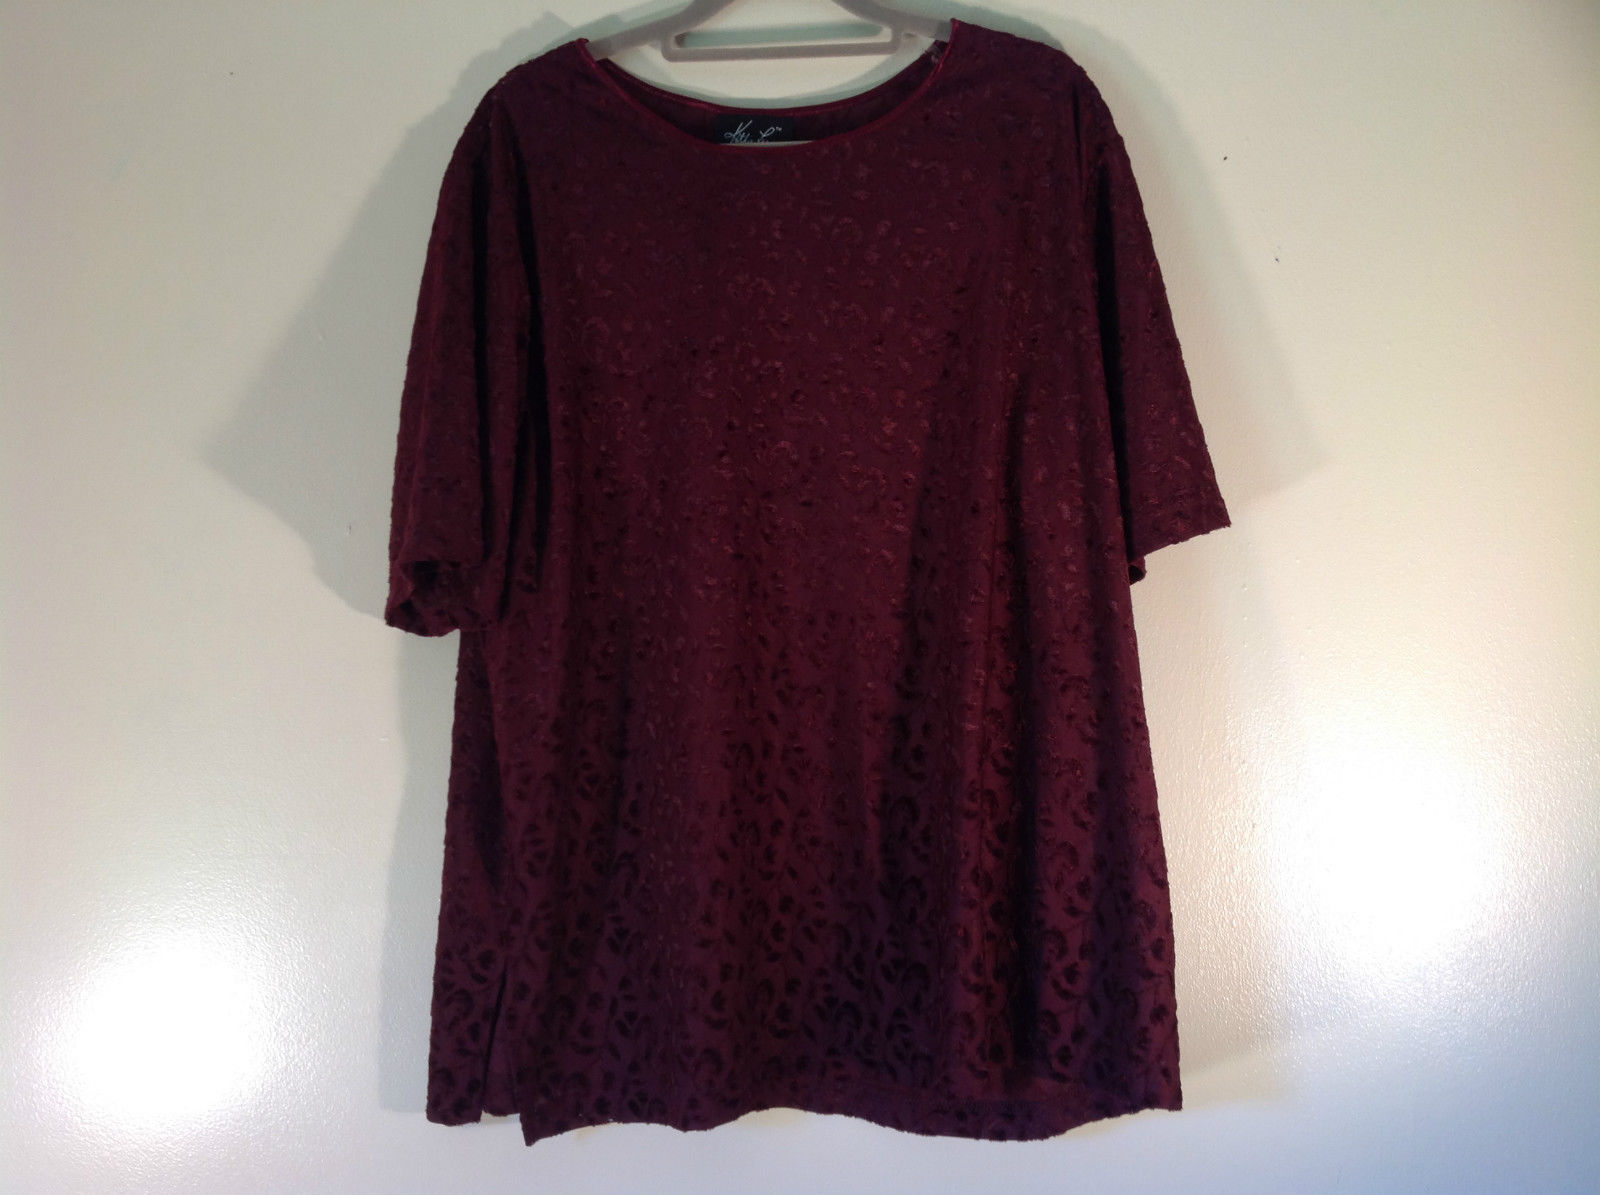 Dark Burgundy Kathie Lee Top Floral Pattern Size 18W to 20W Excellent Condition